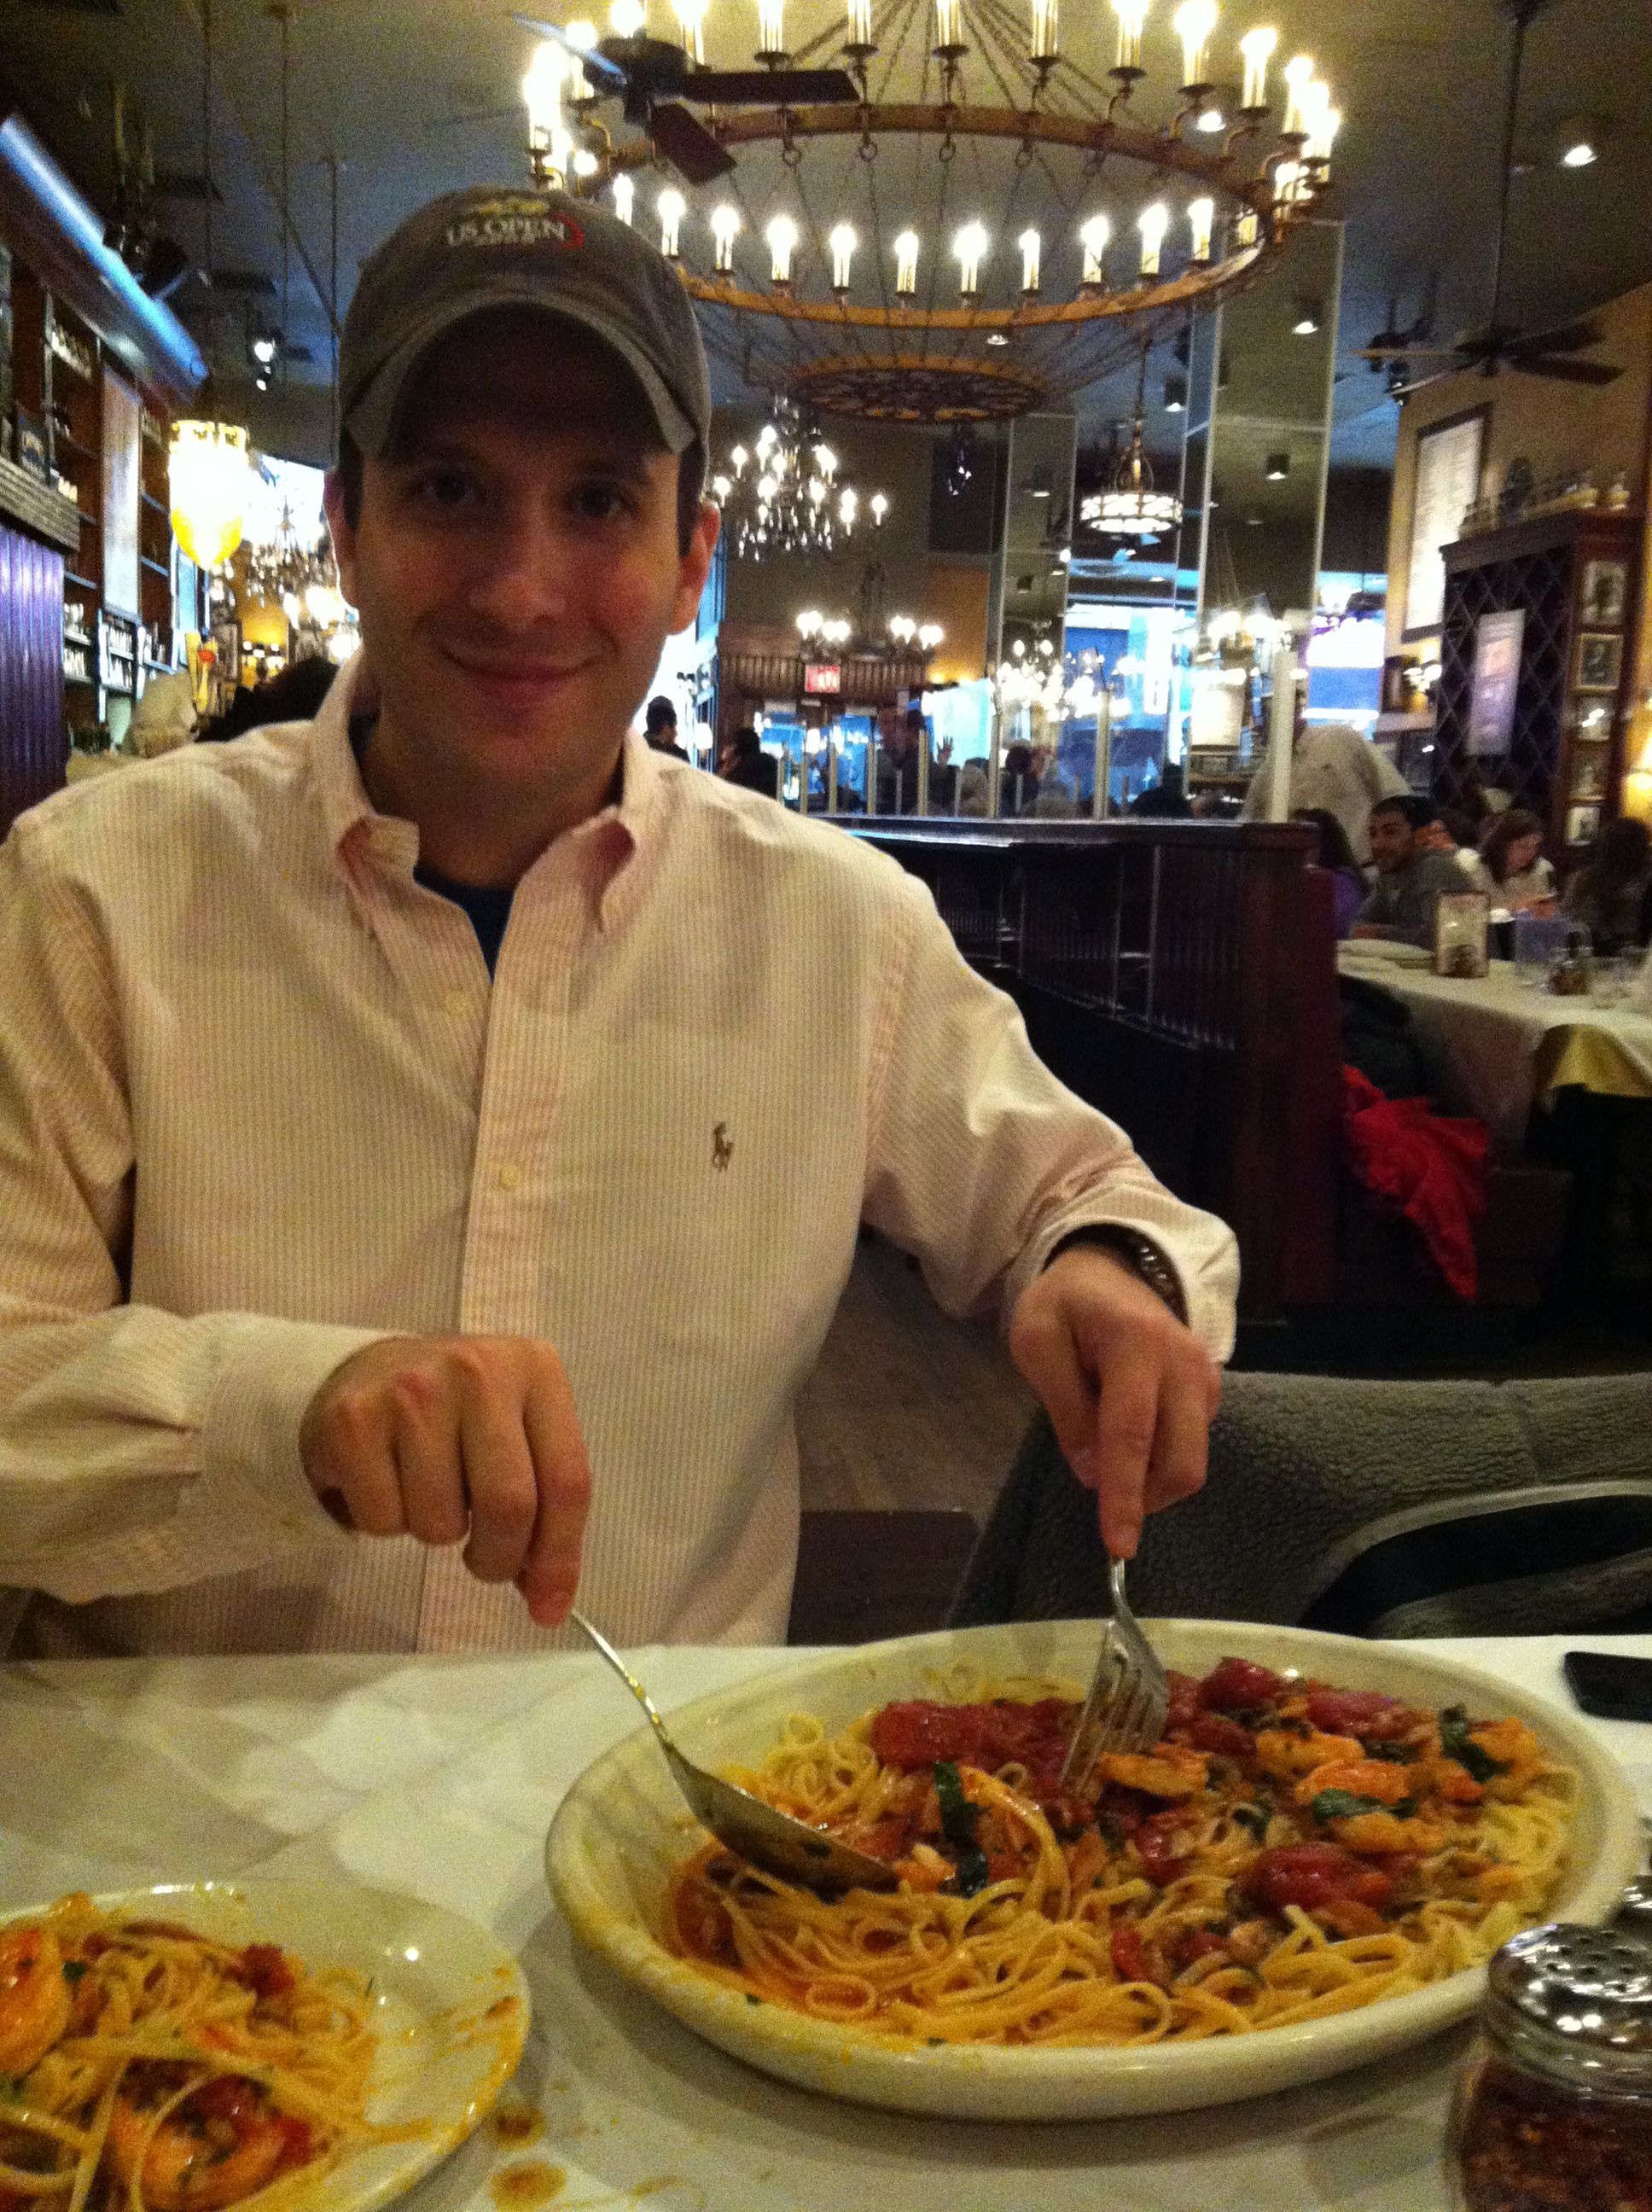 Carmine S Times Square Italian 200 W 44th St New York 212 221 3800